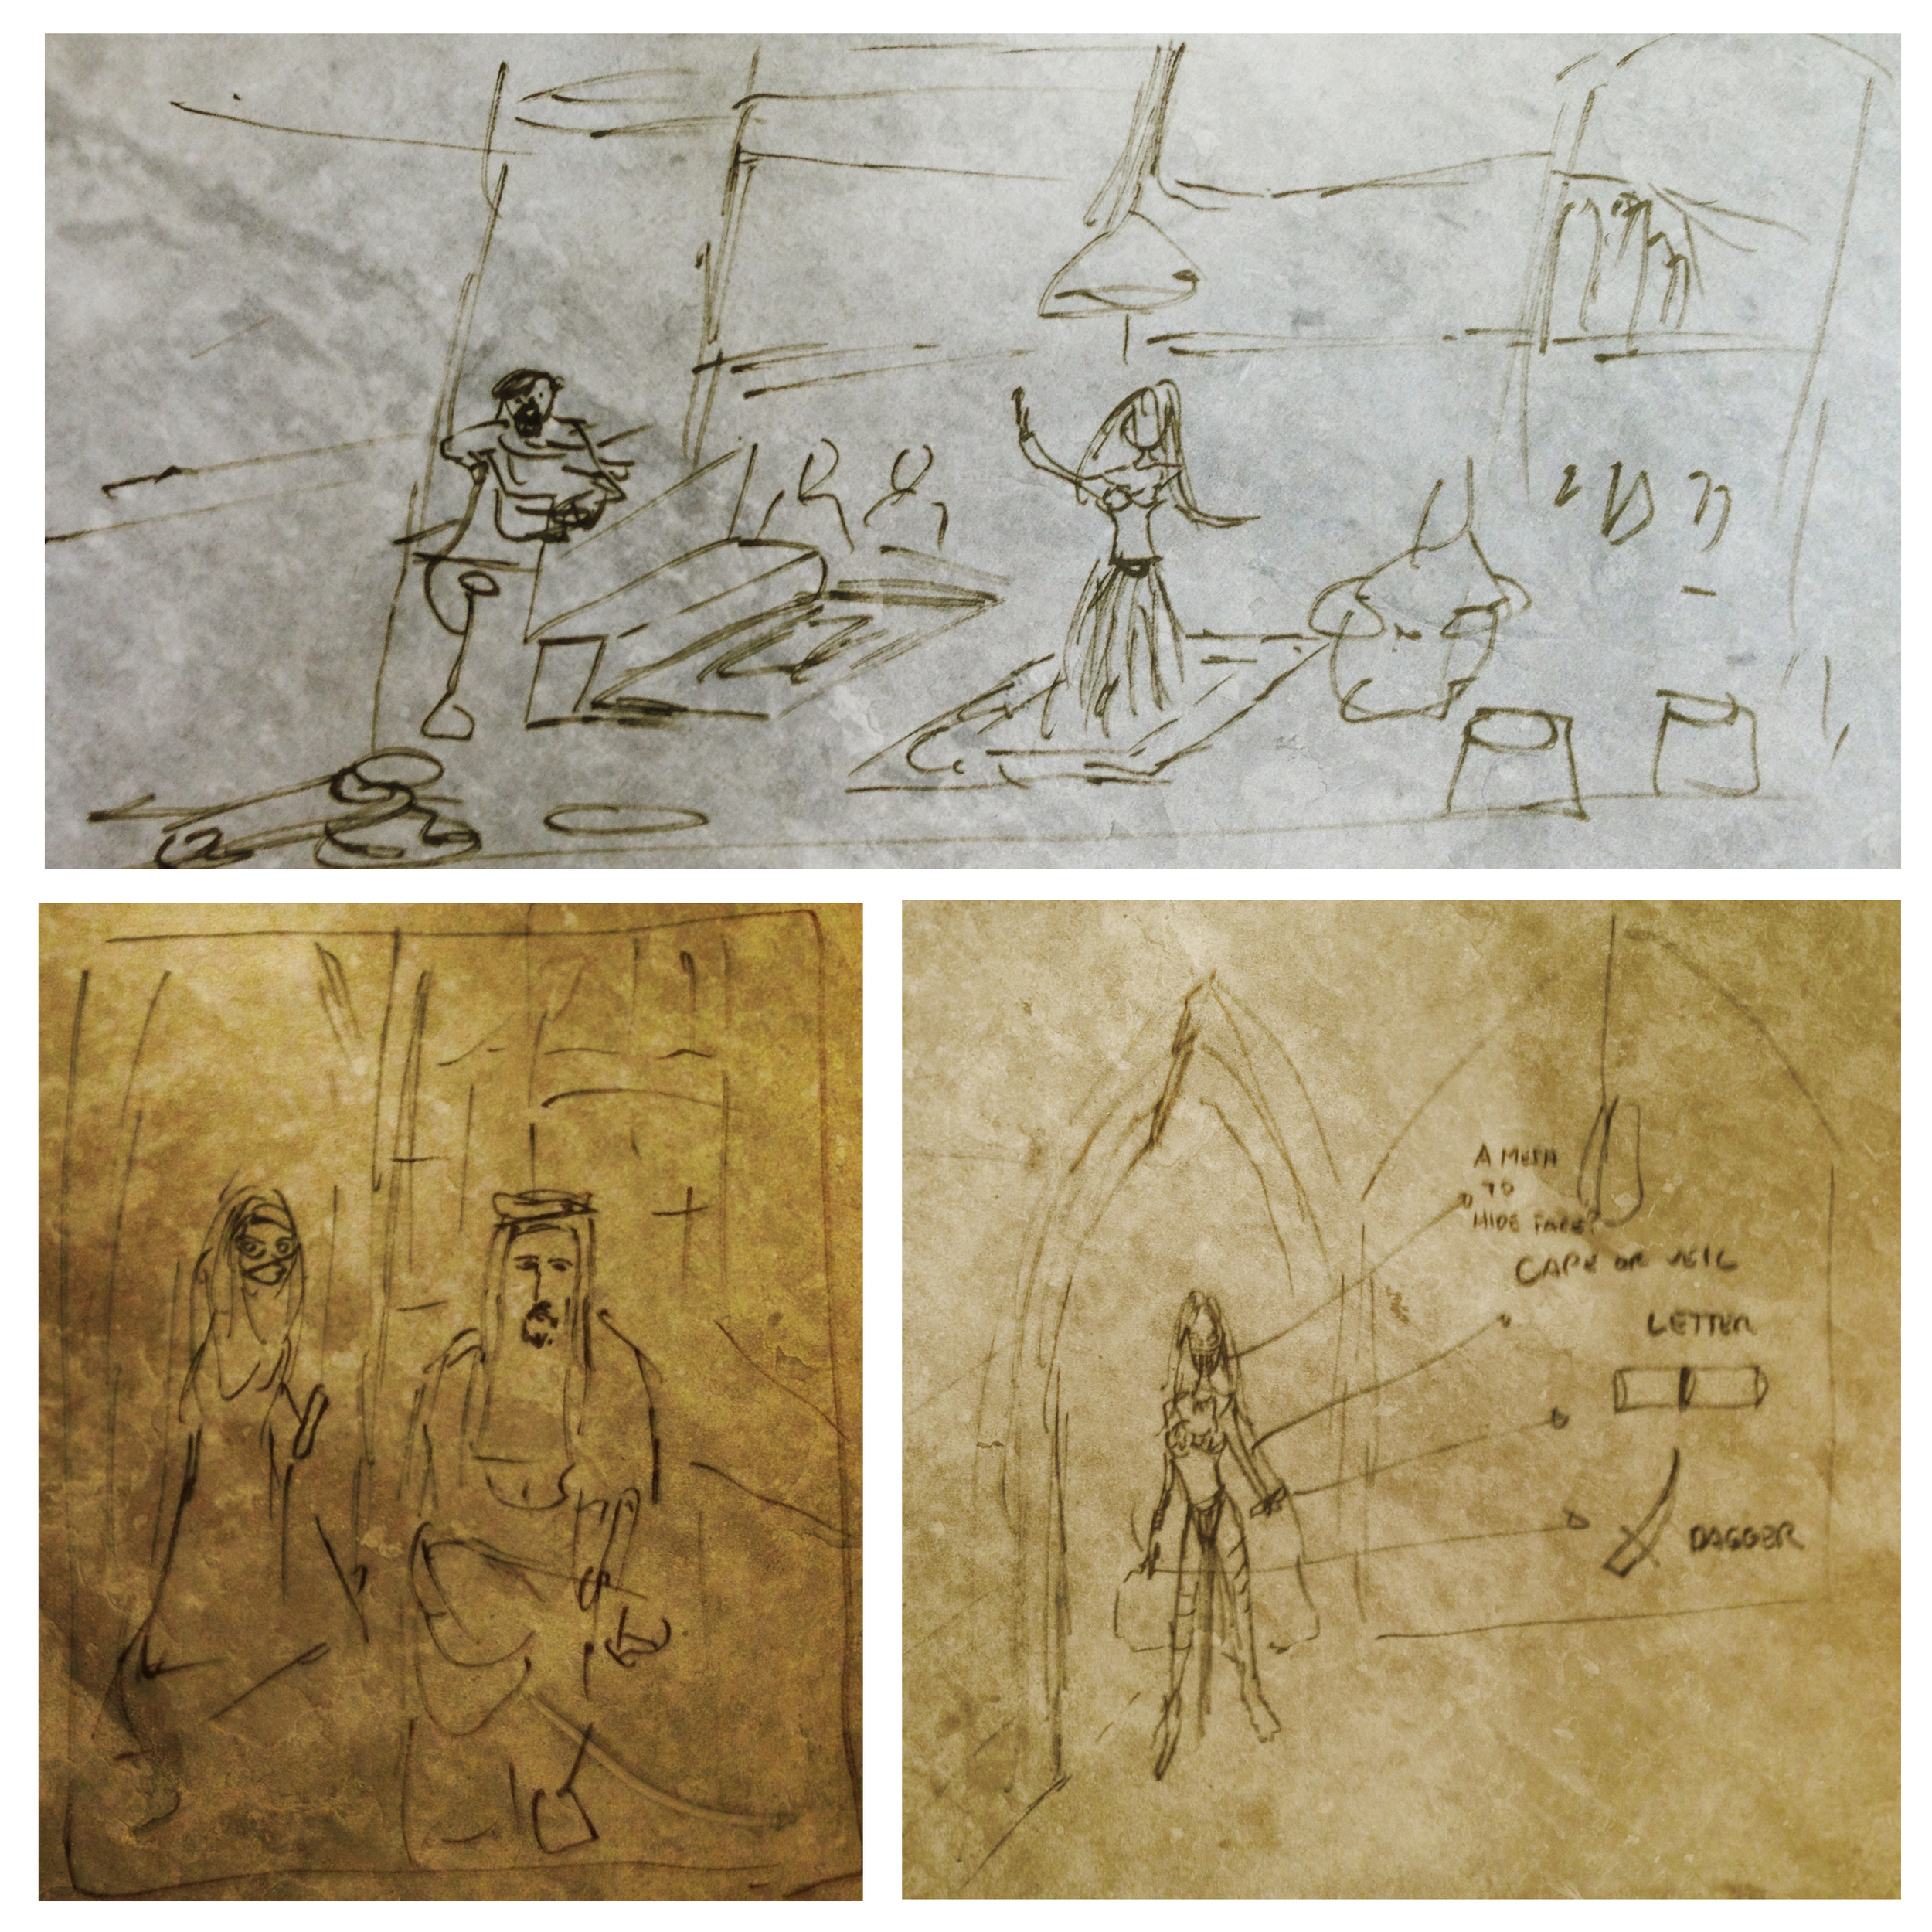 the-orientalist-pedro-bonatto-bts-sketches.jpg